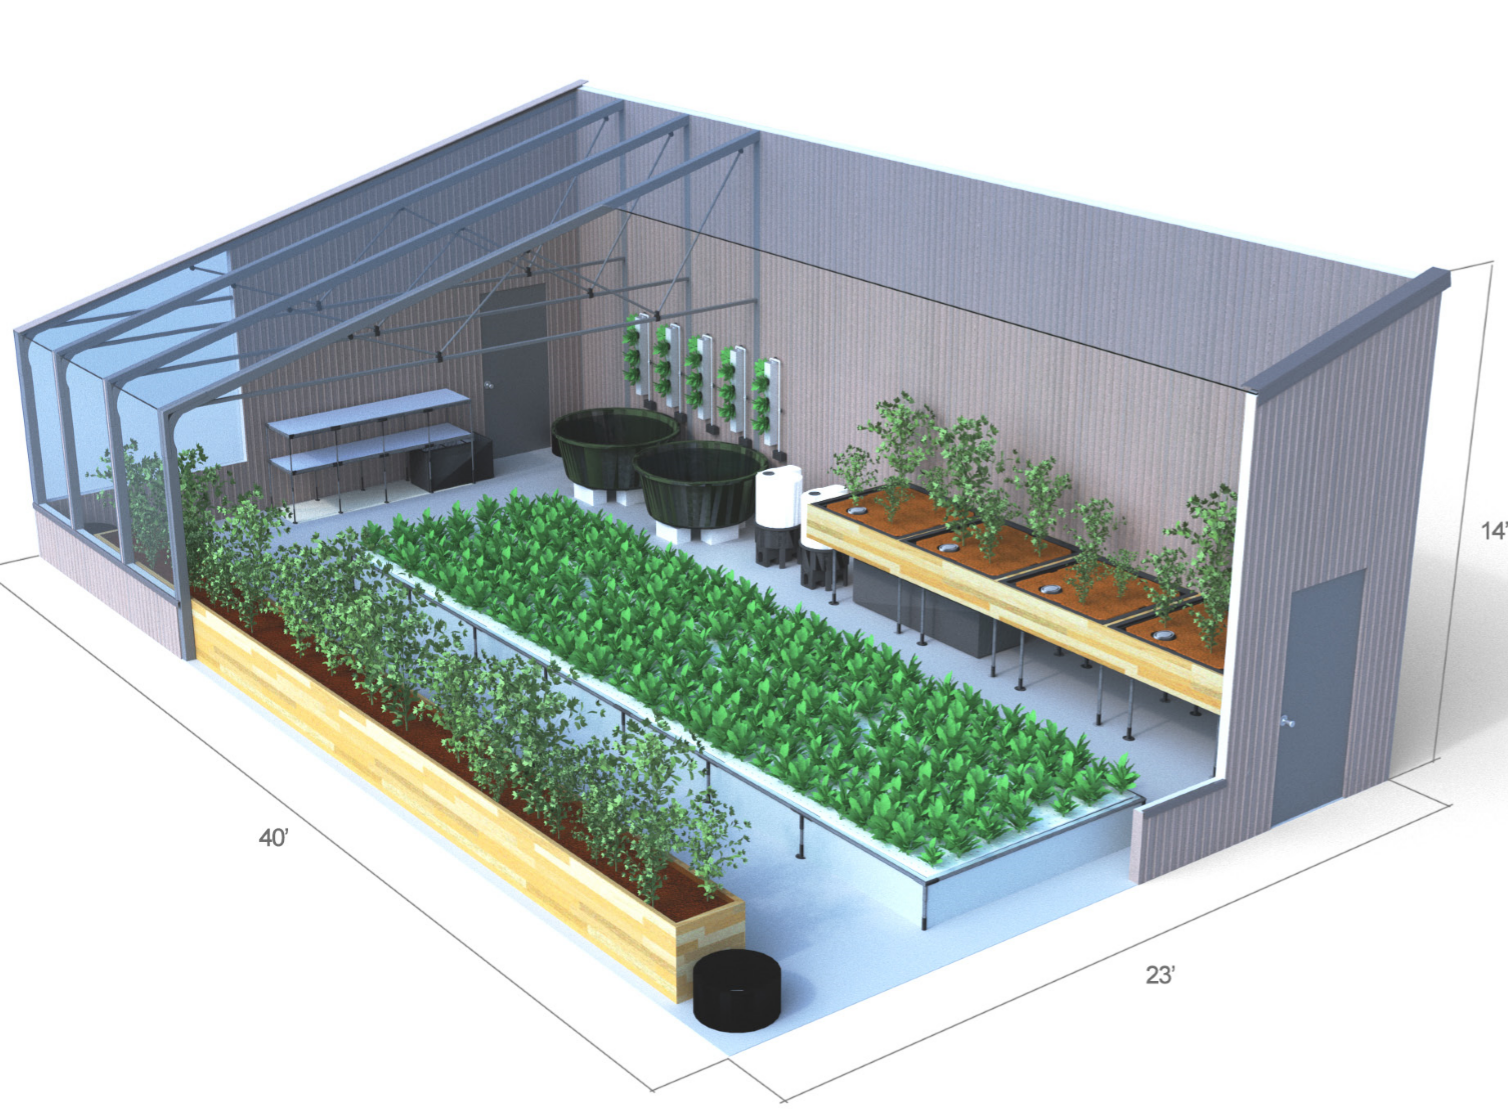 Passive Solar Greenhouse Design Course Reap Abundant Harvests Year